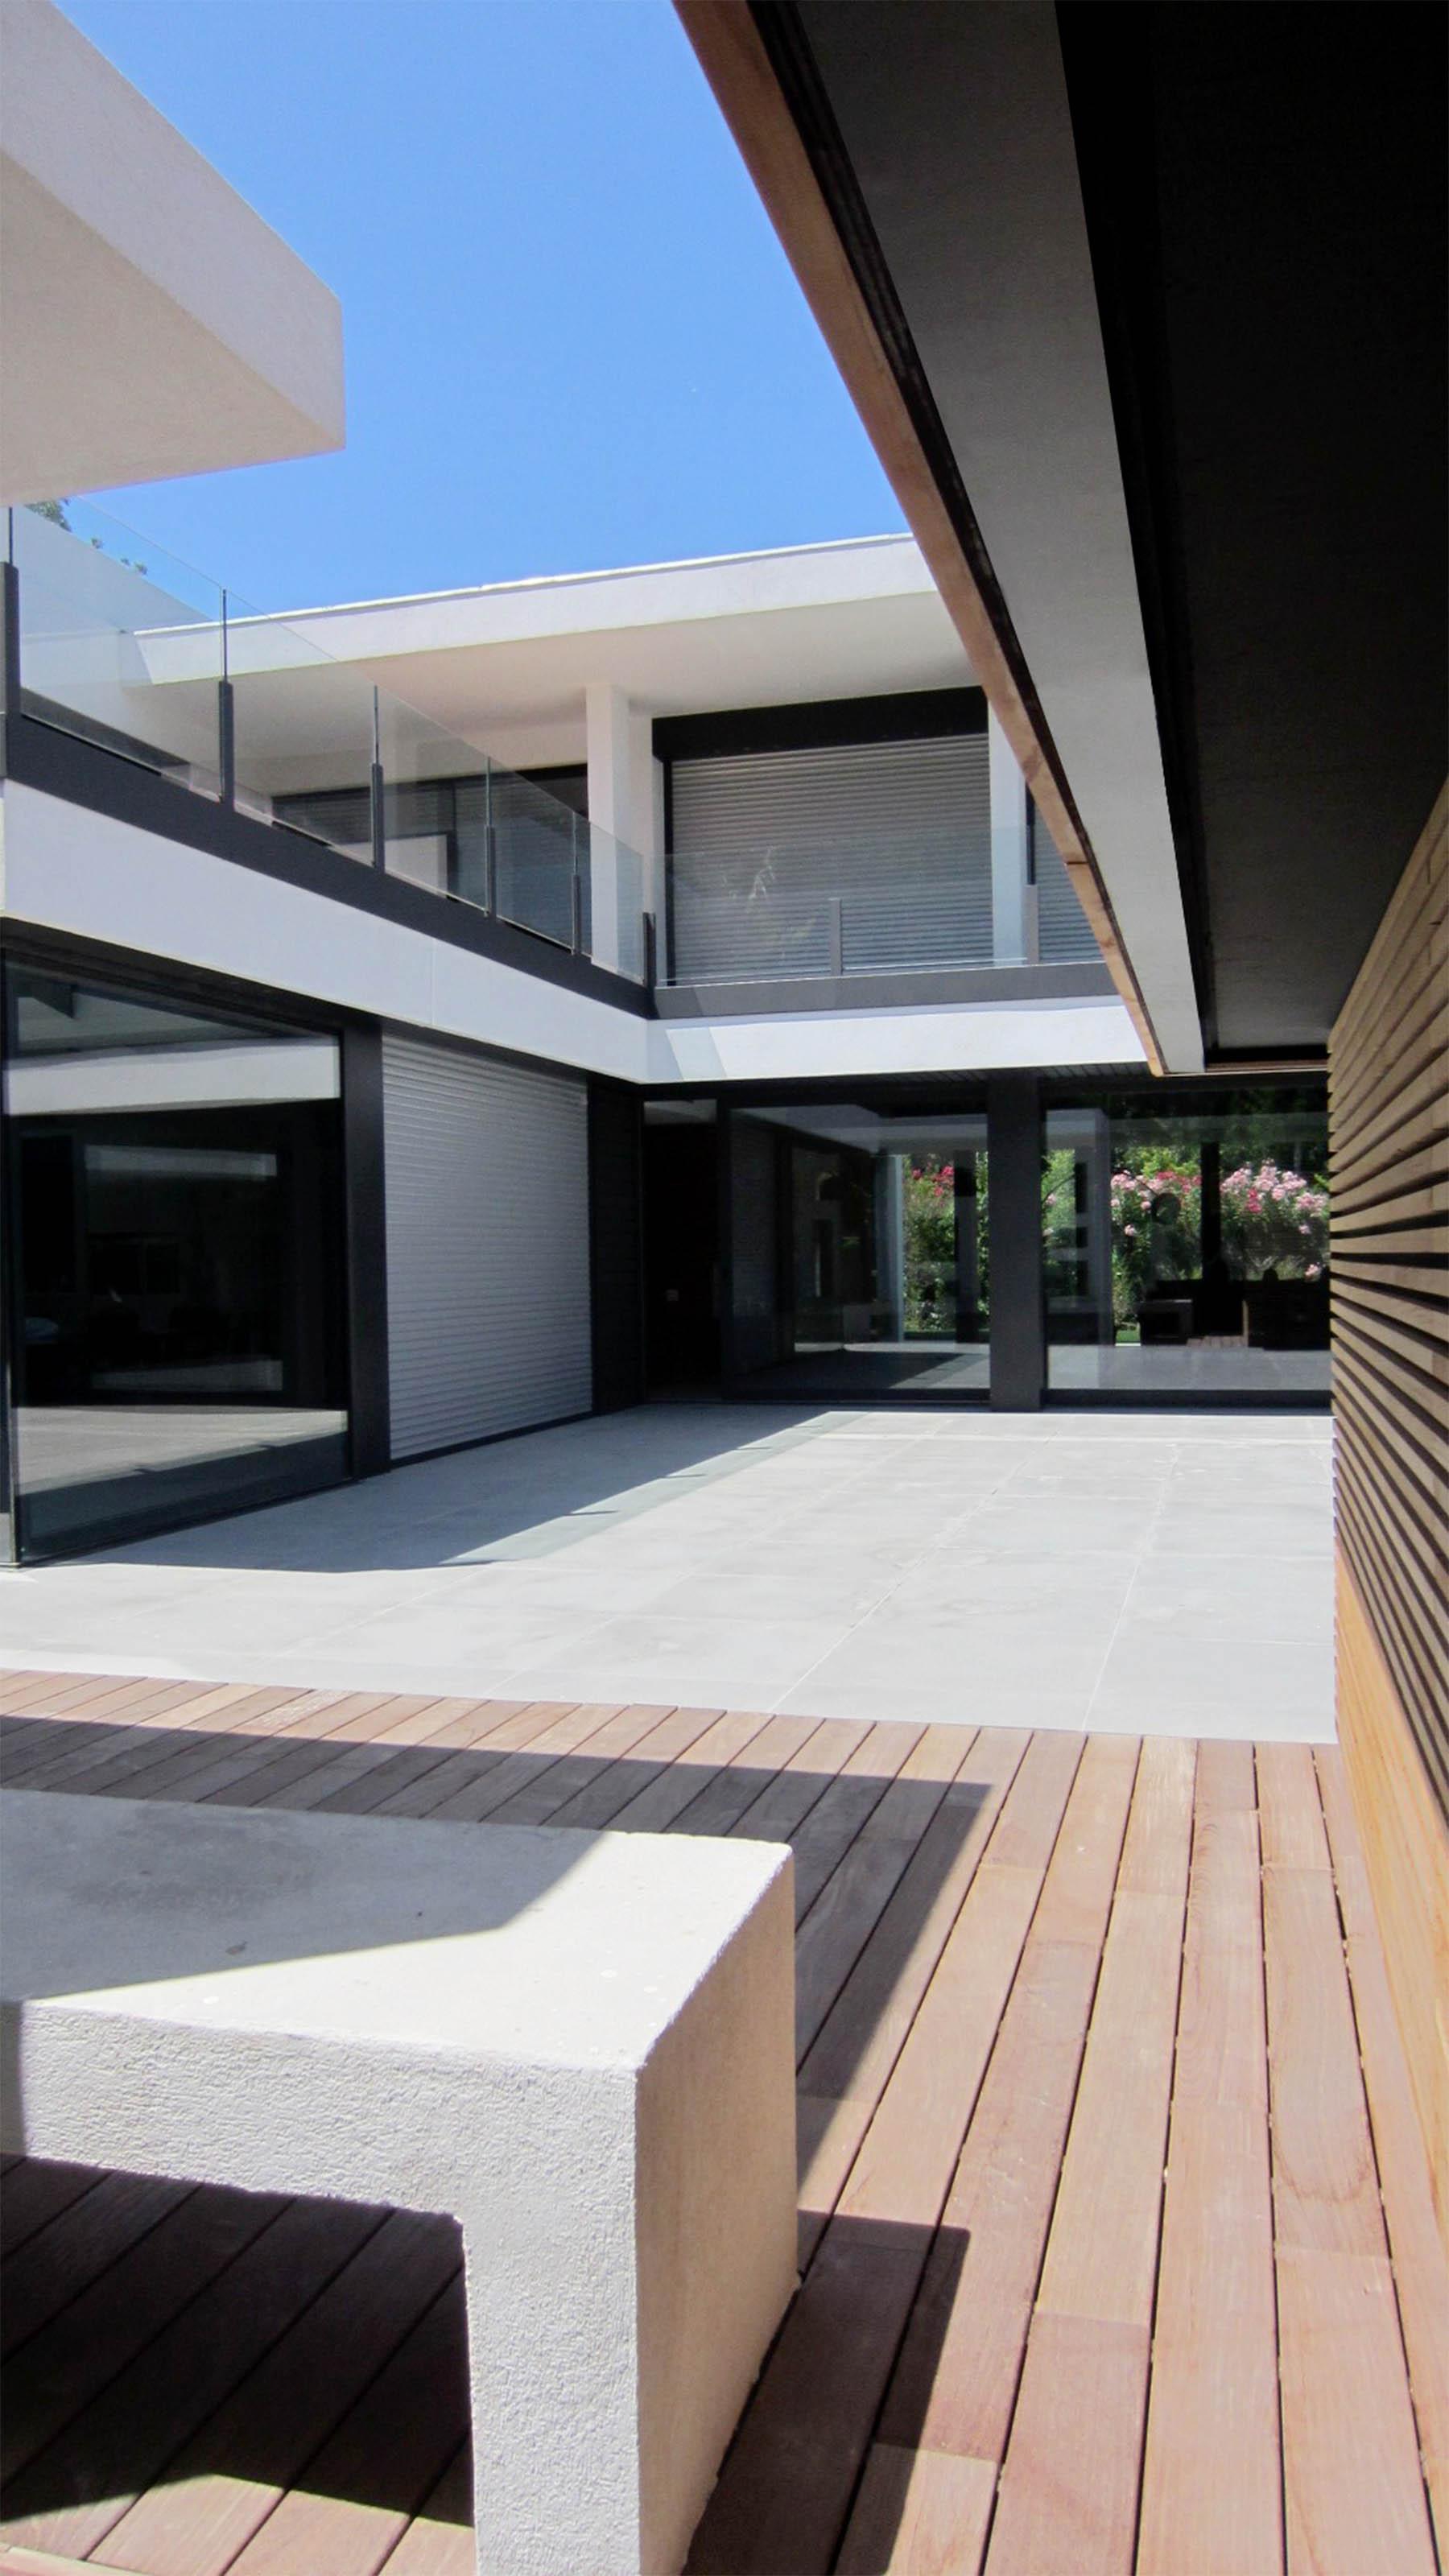 Villa-AJ-03.jpg